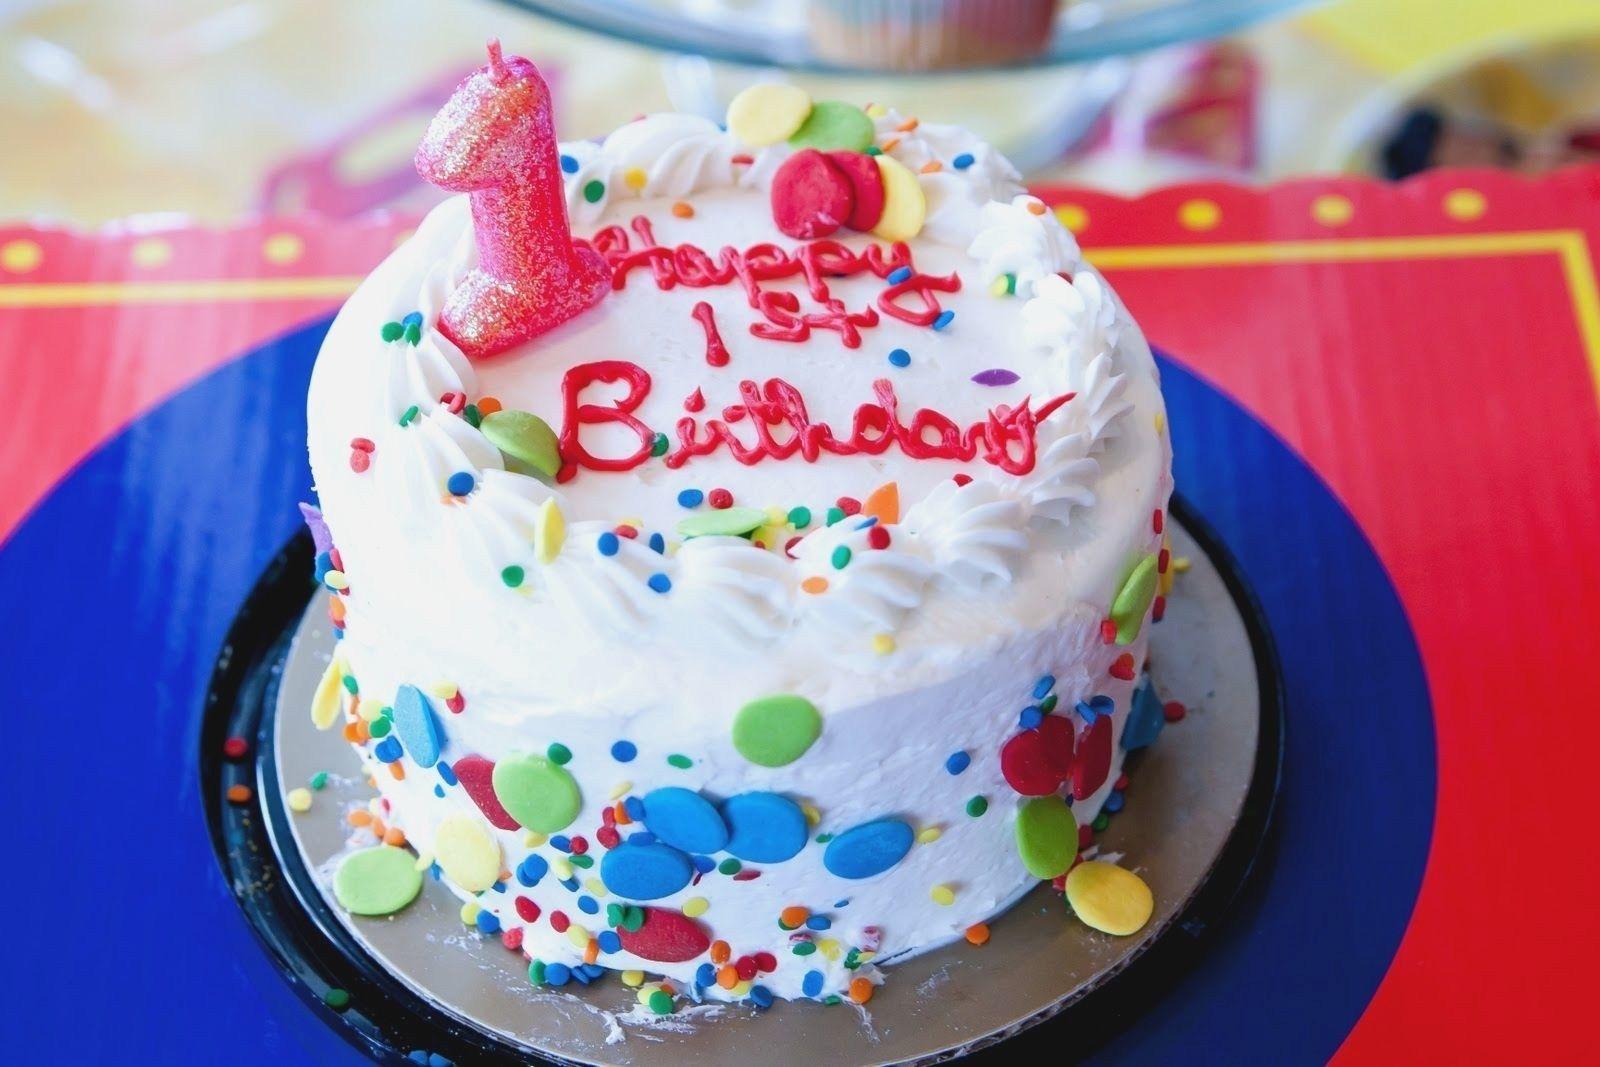 Astonishing 20 Creative Image Of Walmart Bakery Birthday Cakes Order Birthday Cards Printable Trancafe Filternl